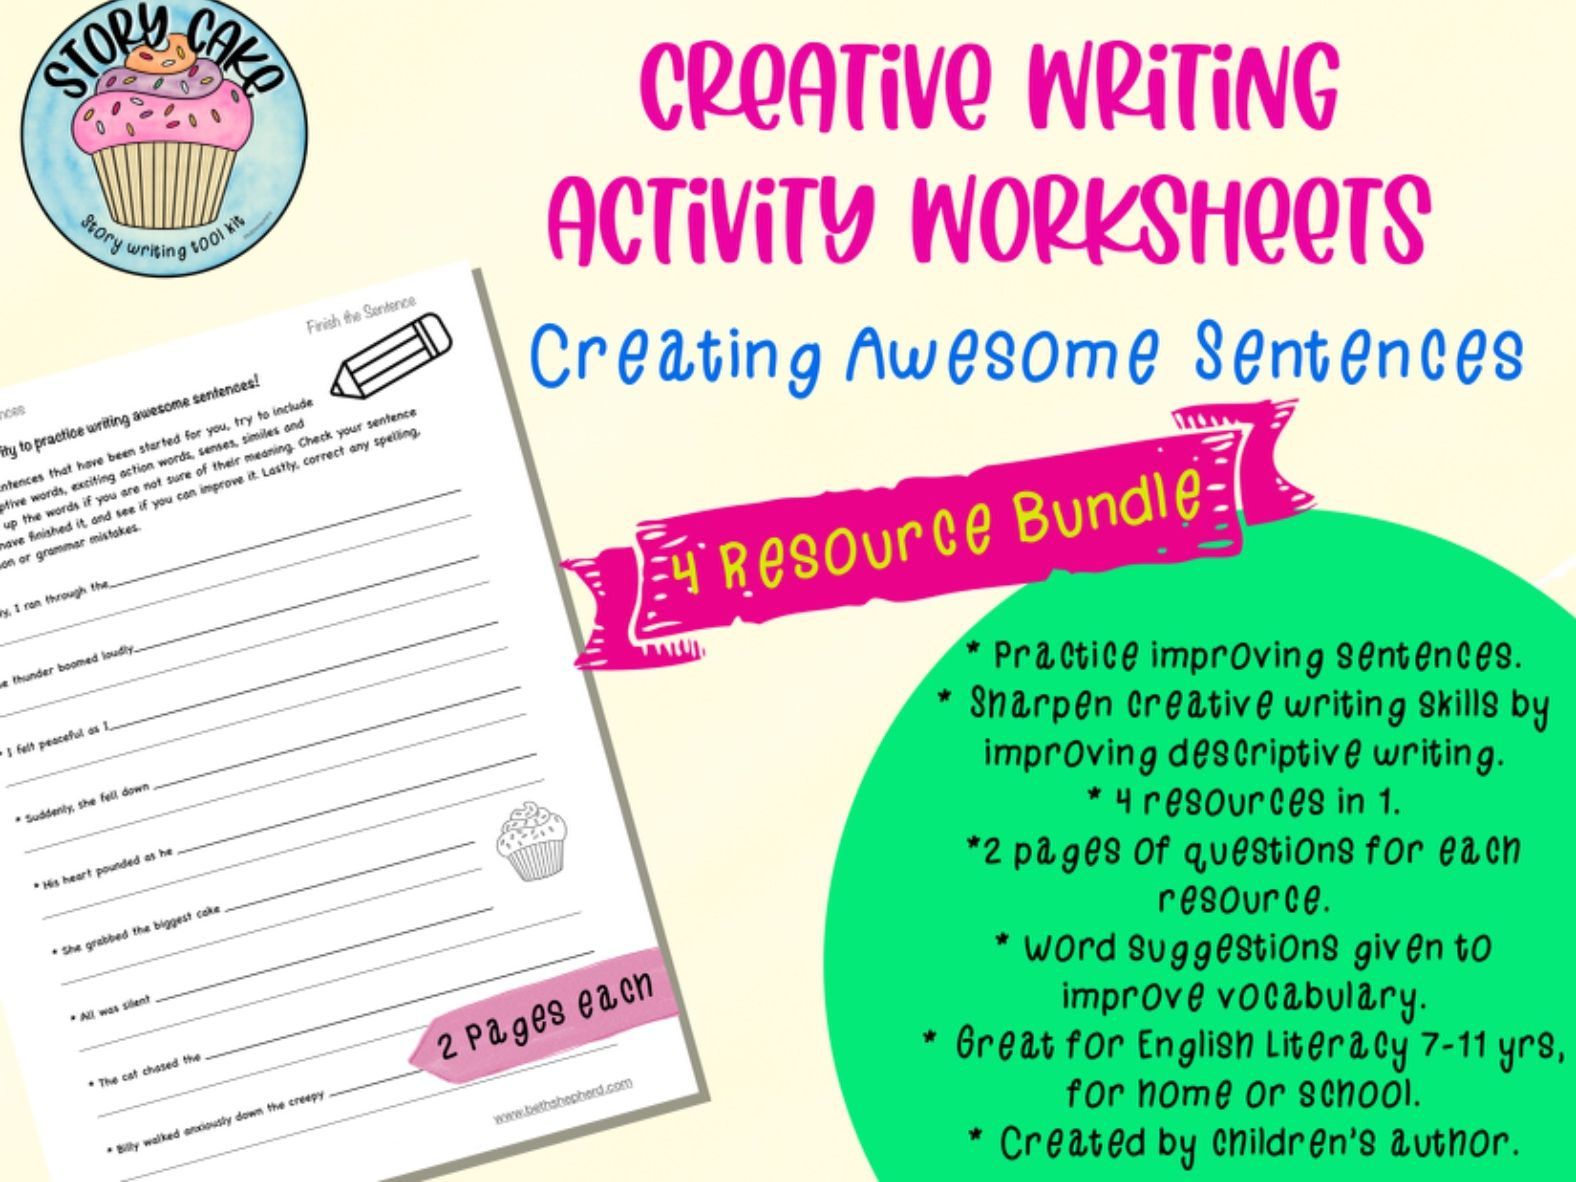 Create Awesome Sentences - 4 in 1 resource bundle - Creative writing, descriptive sentences, improve writing, sentence building, expand vocabulary, develop writing skills.